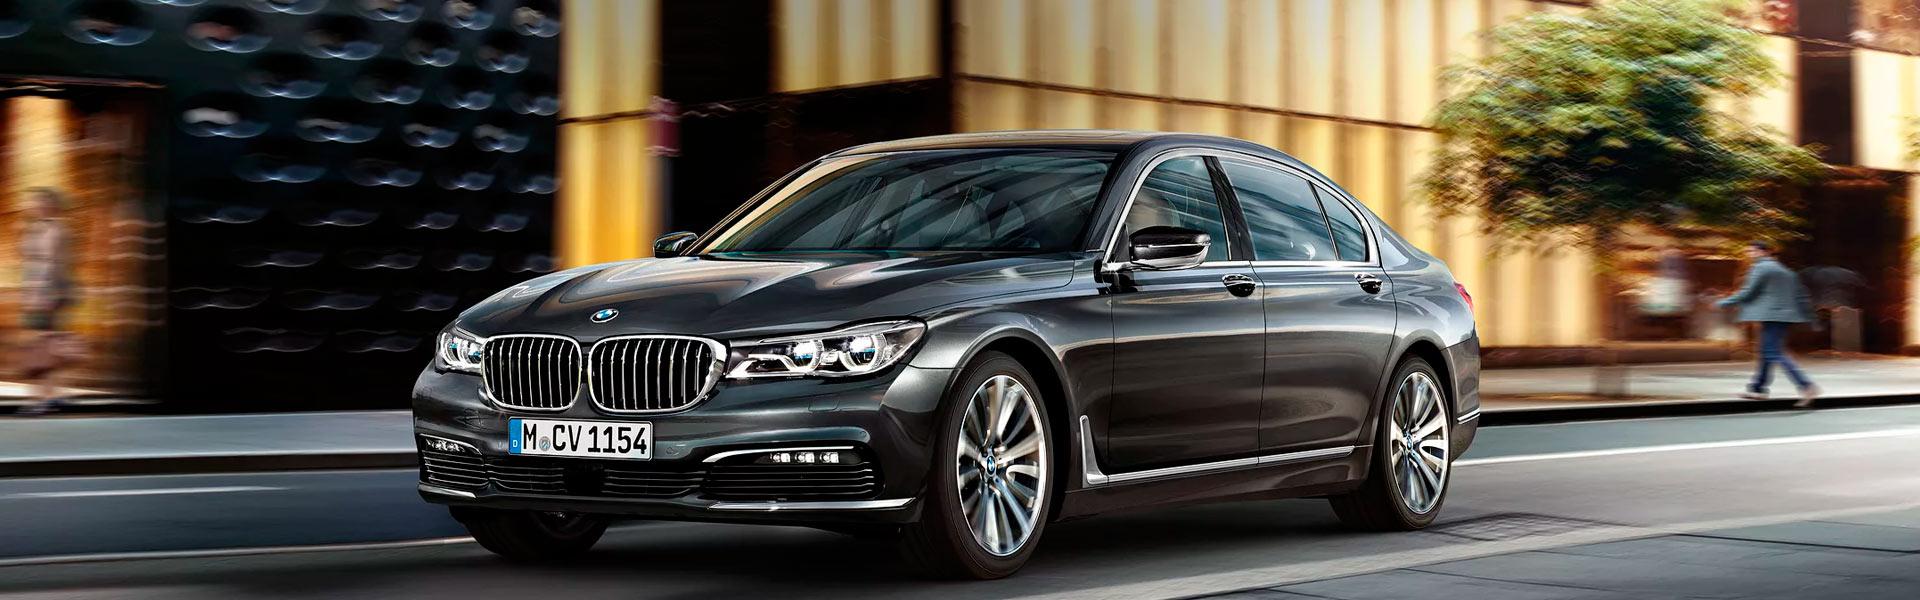 Сцепление на BMW 7-series